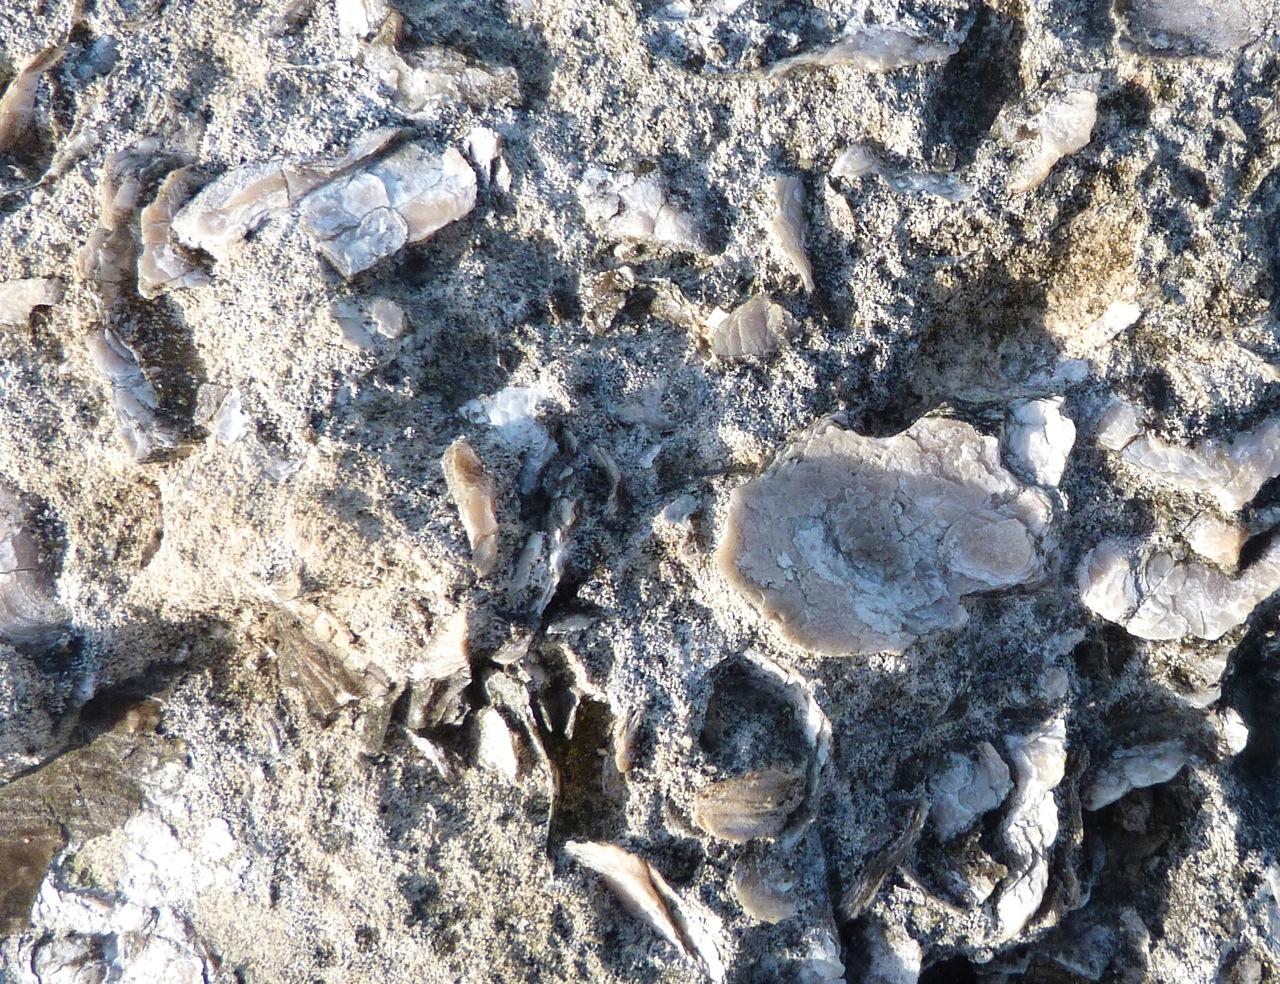 Portland Bill, Dorset - Rocks & Fossils 7